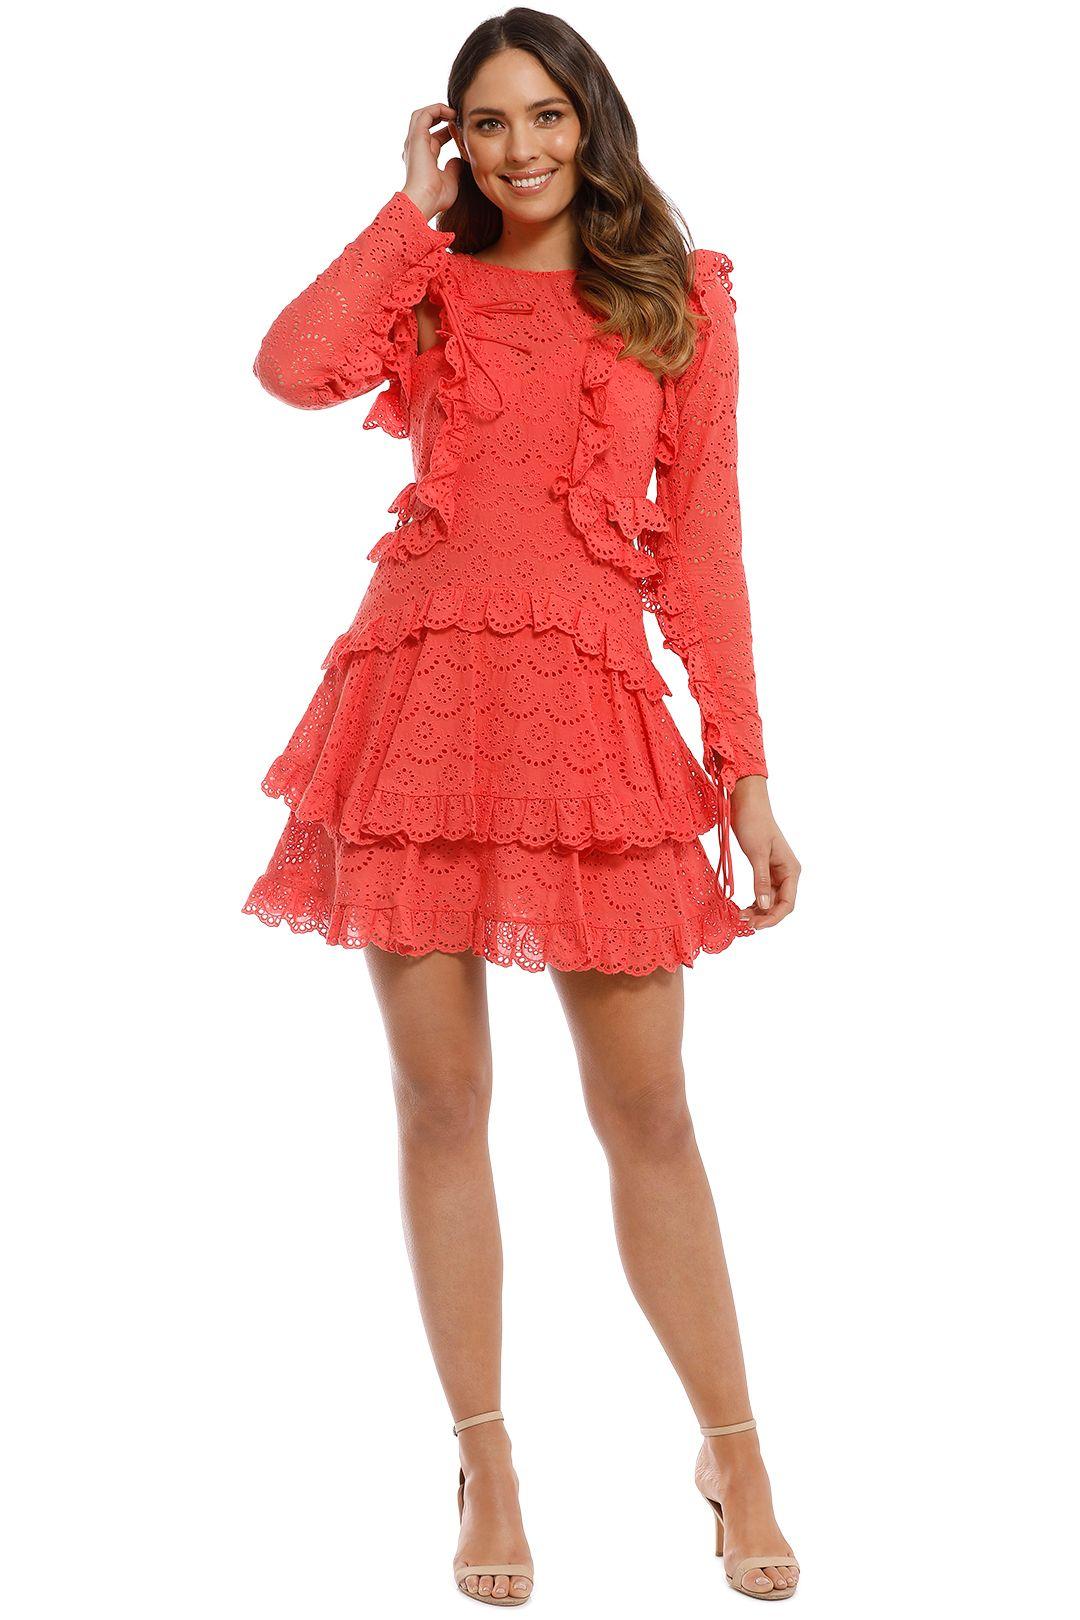 Thurley - Ebony Dress - Lipstick - Front